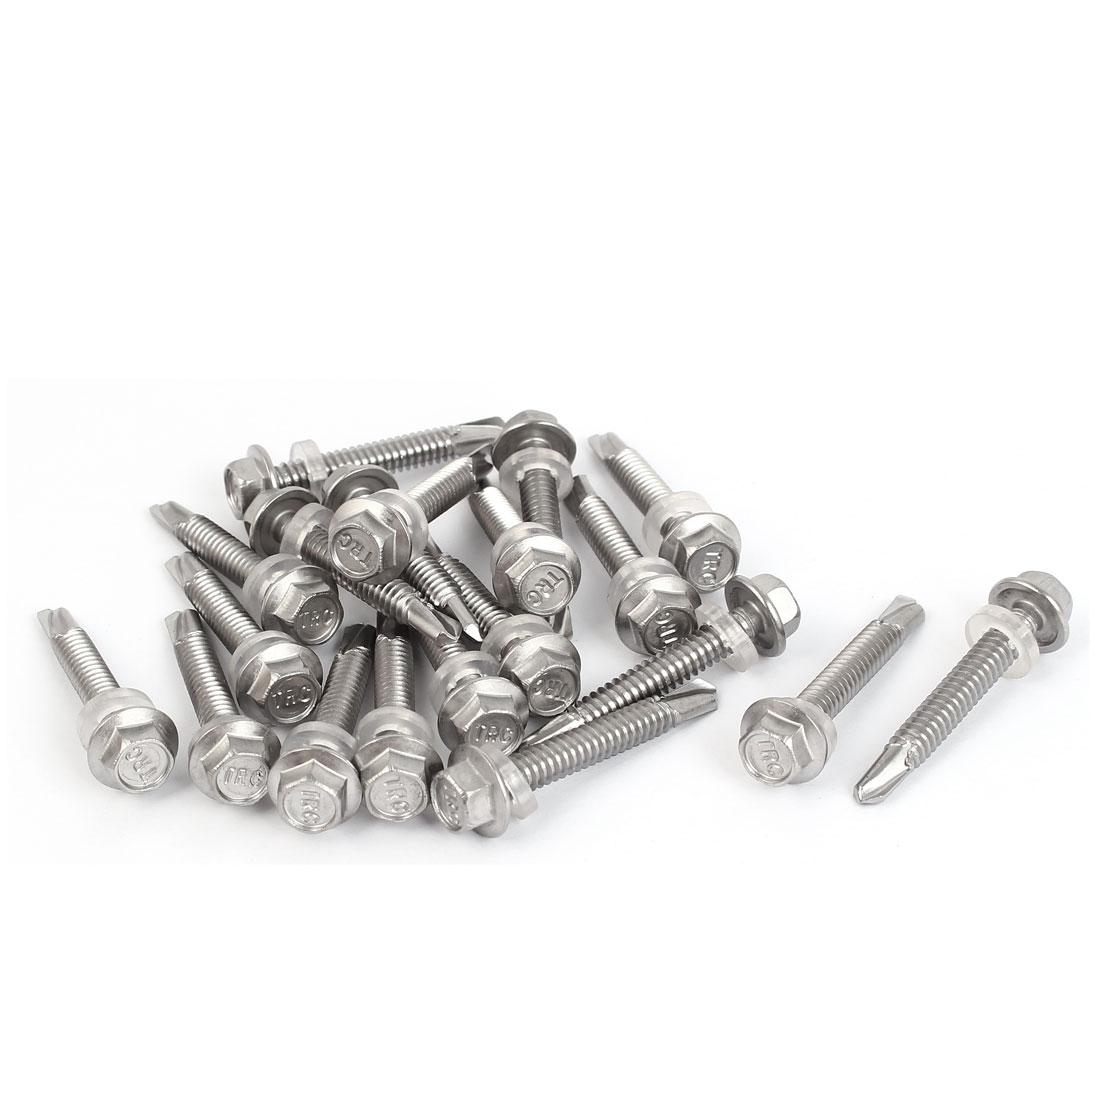 M5.5x38mm #12-14 Thread Stainless Steel Hex Head Self Drilling Screws w Washer 20 Pcs